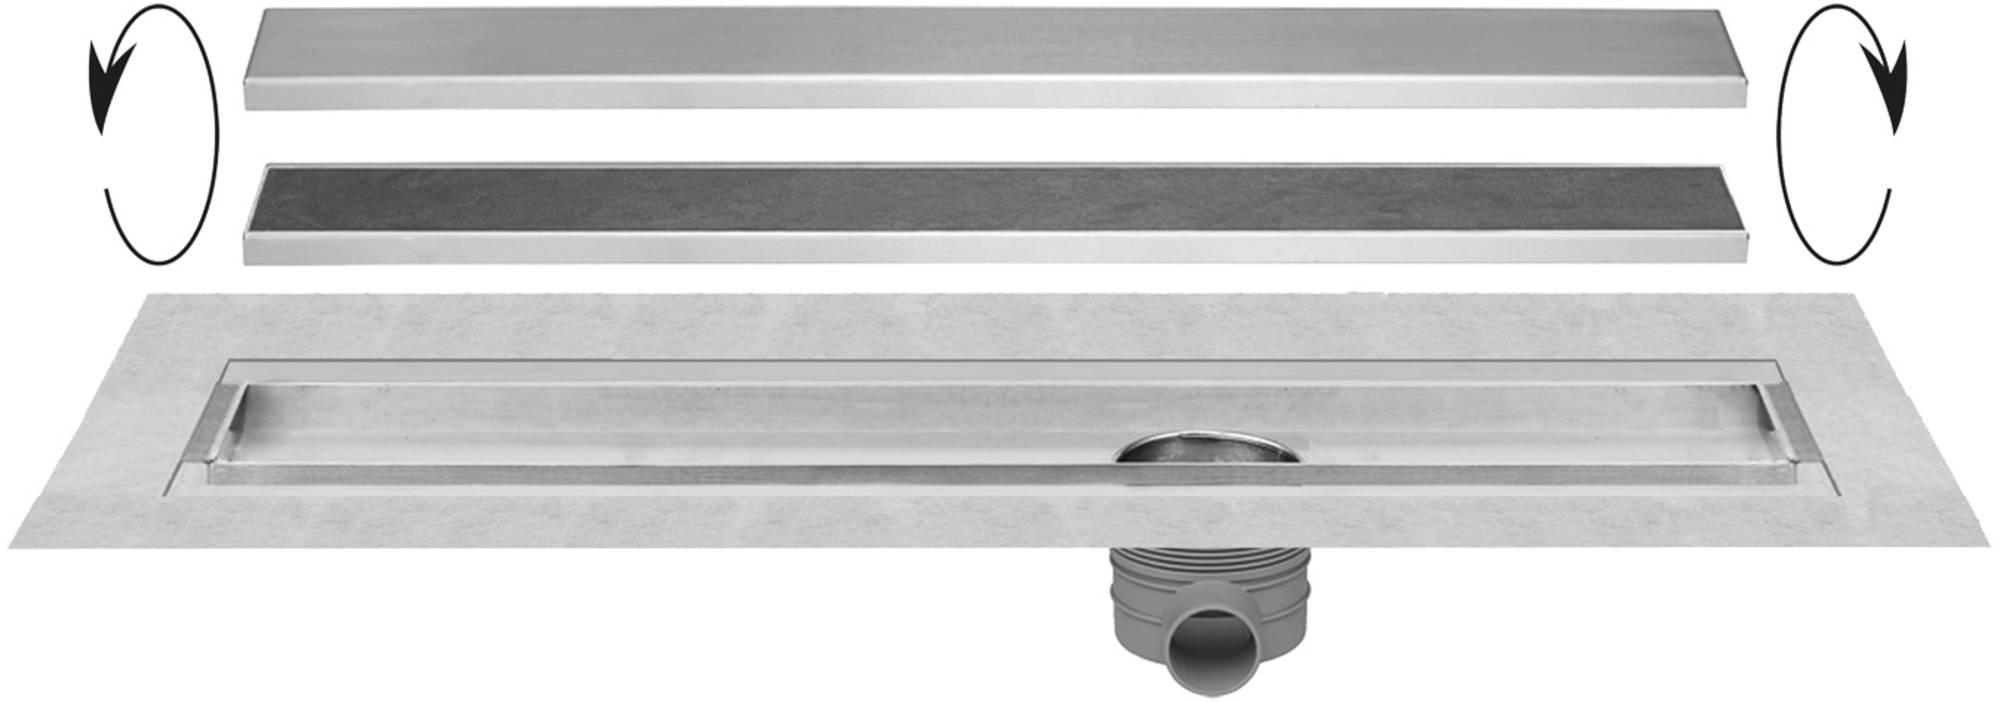 Easy Drain Multi TAF afvoergoot 90 cm rooster als zero of tegel design RVS